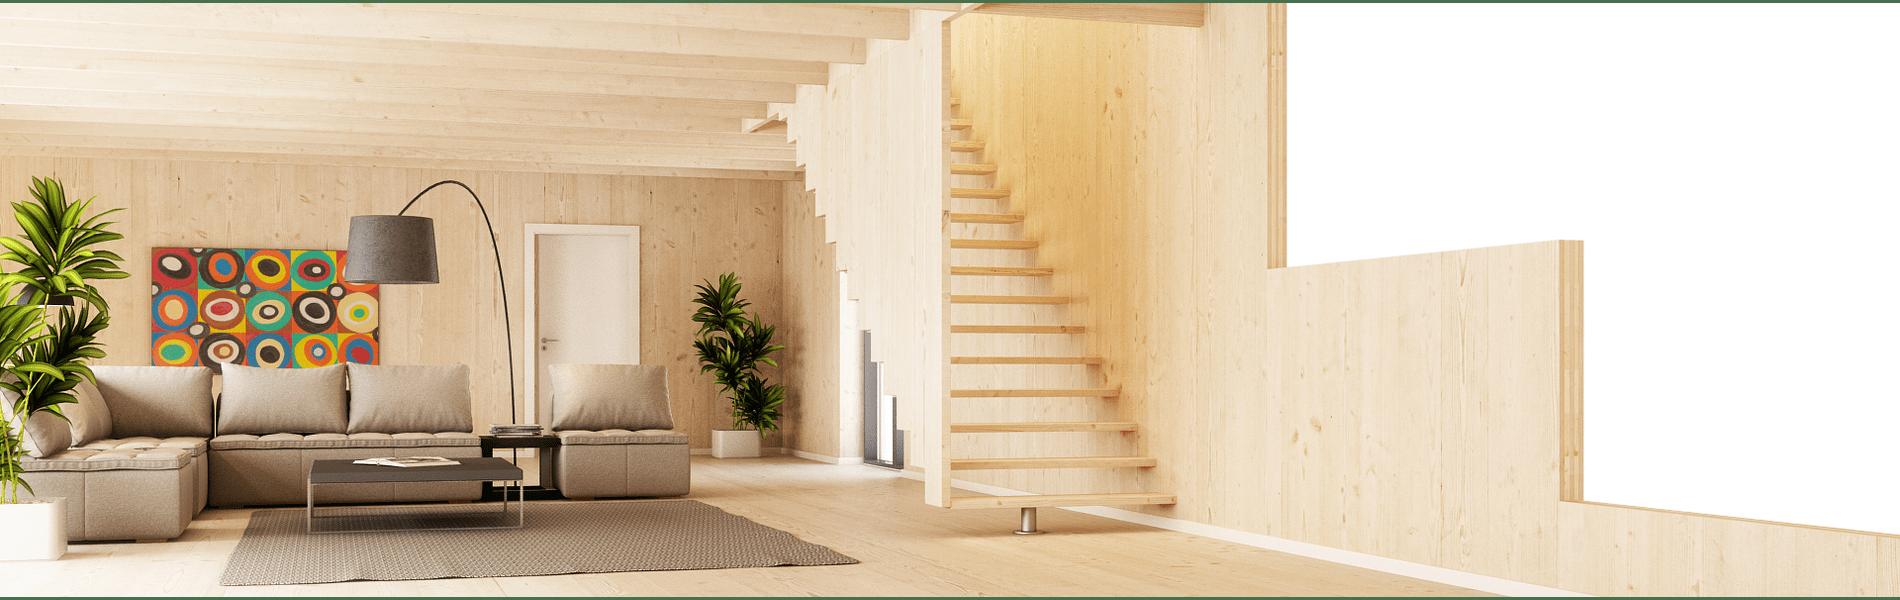 Bsp Brettsperrholz - Moso Bambusparkett, Bambusplatten, Bambus X